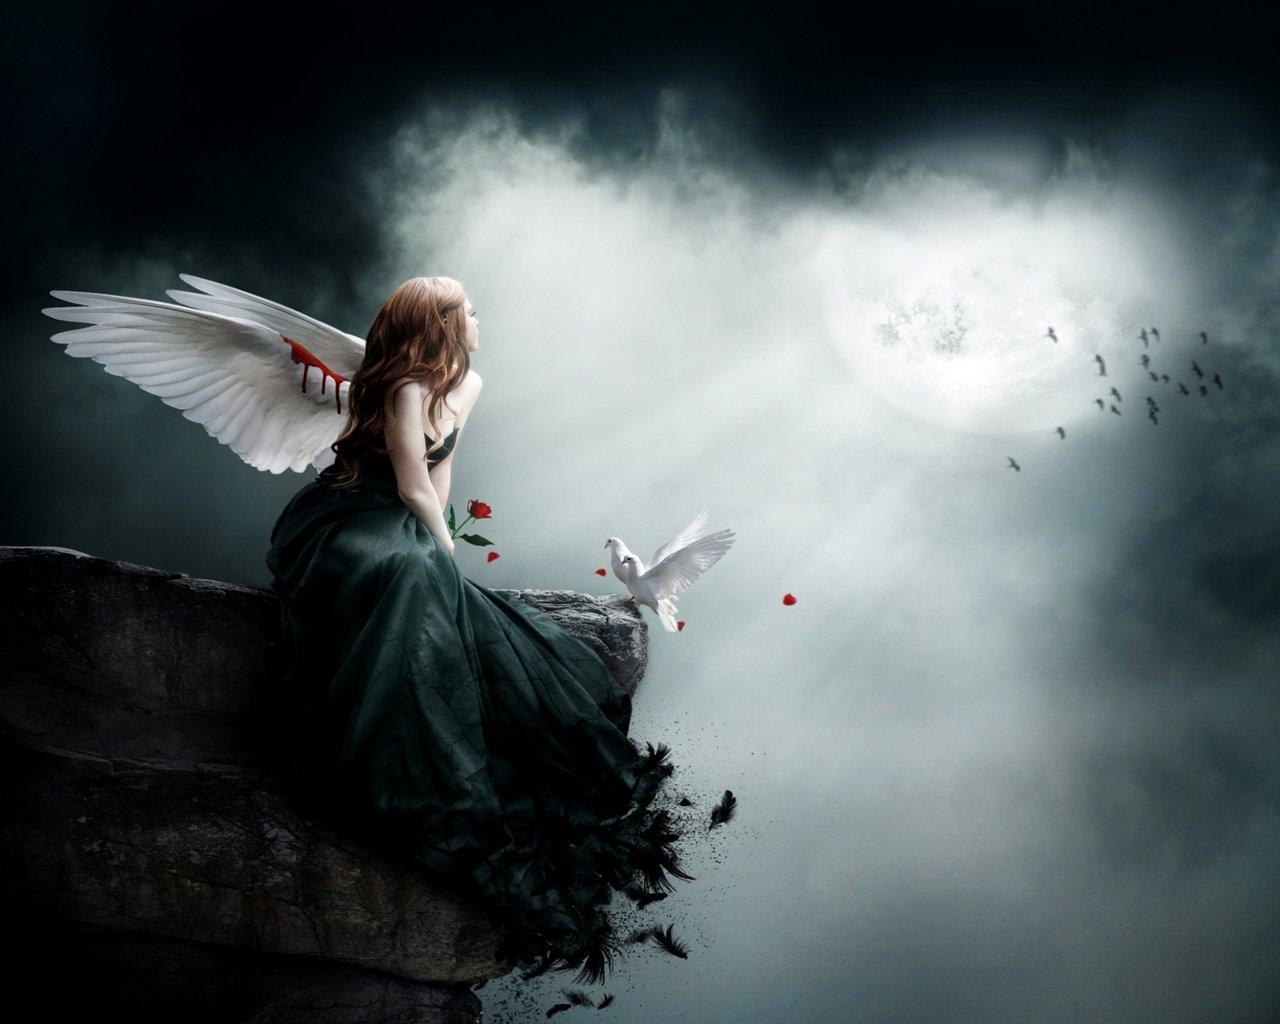 Gothic girl wallpaper wallpapersafari - Gothic angel wallpaper ...